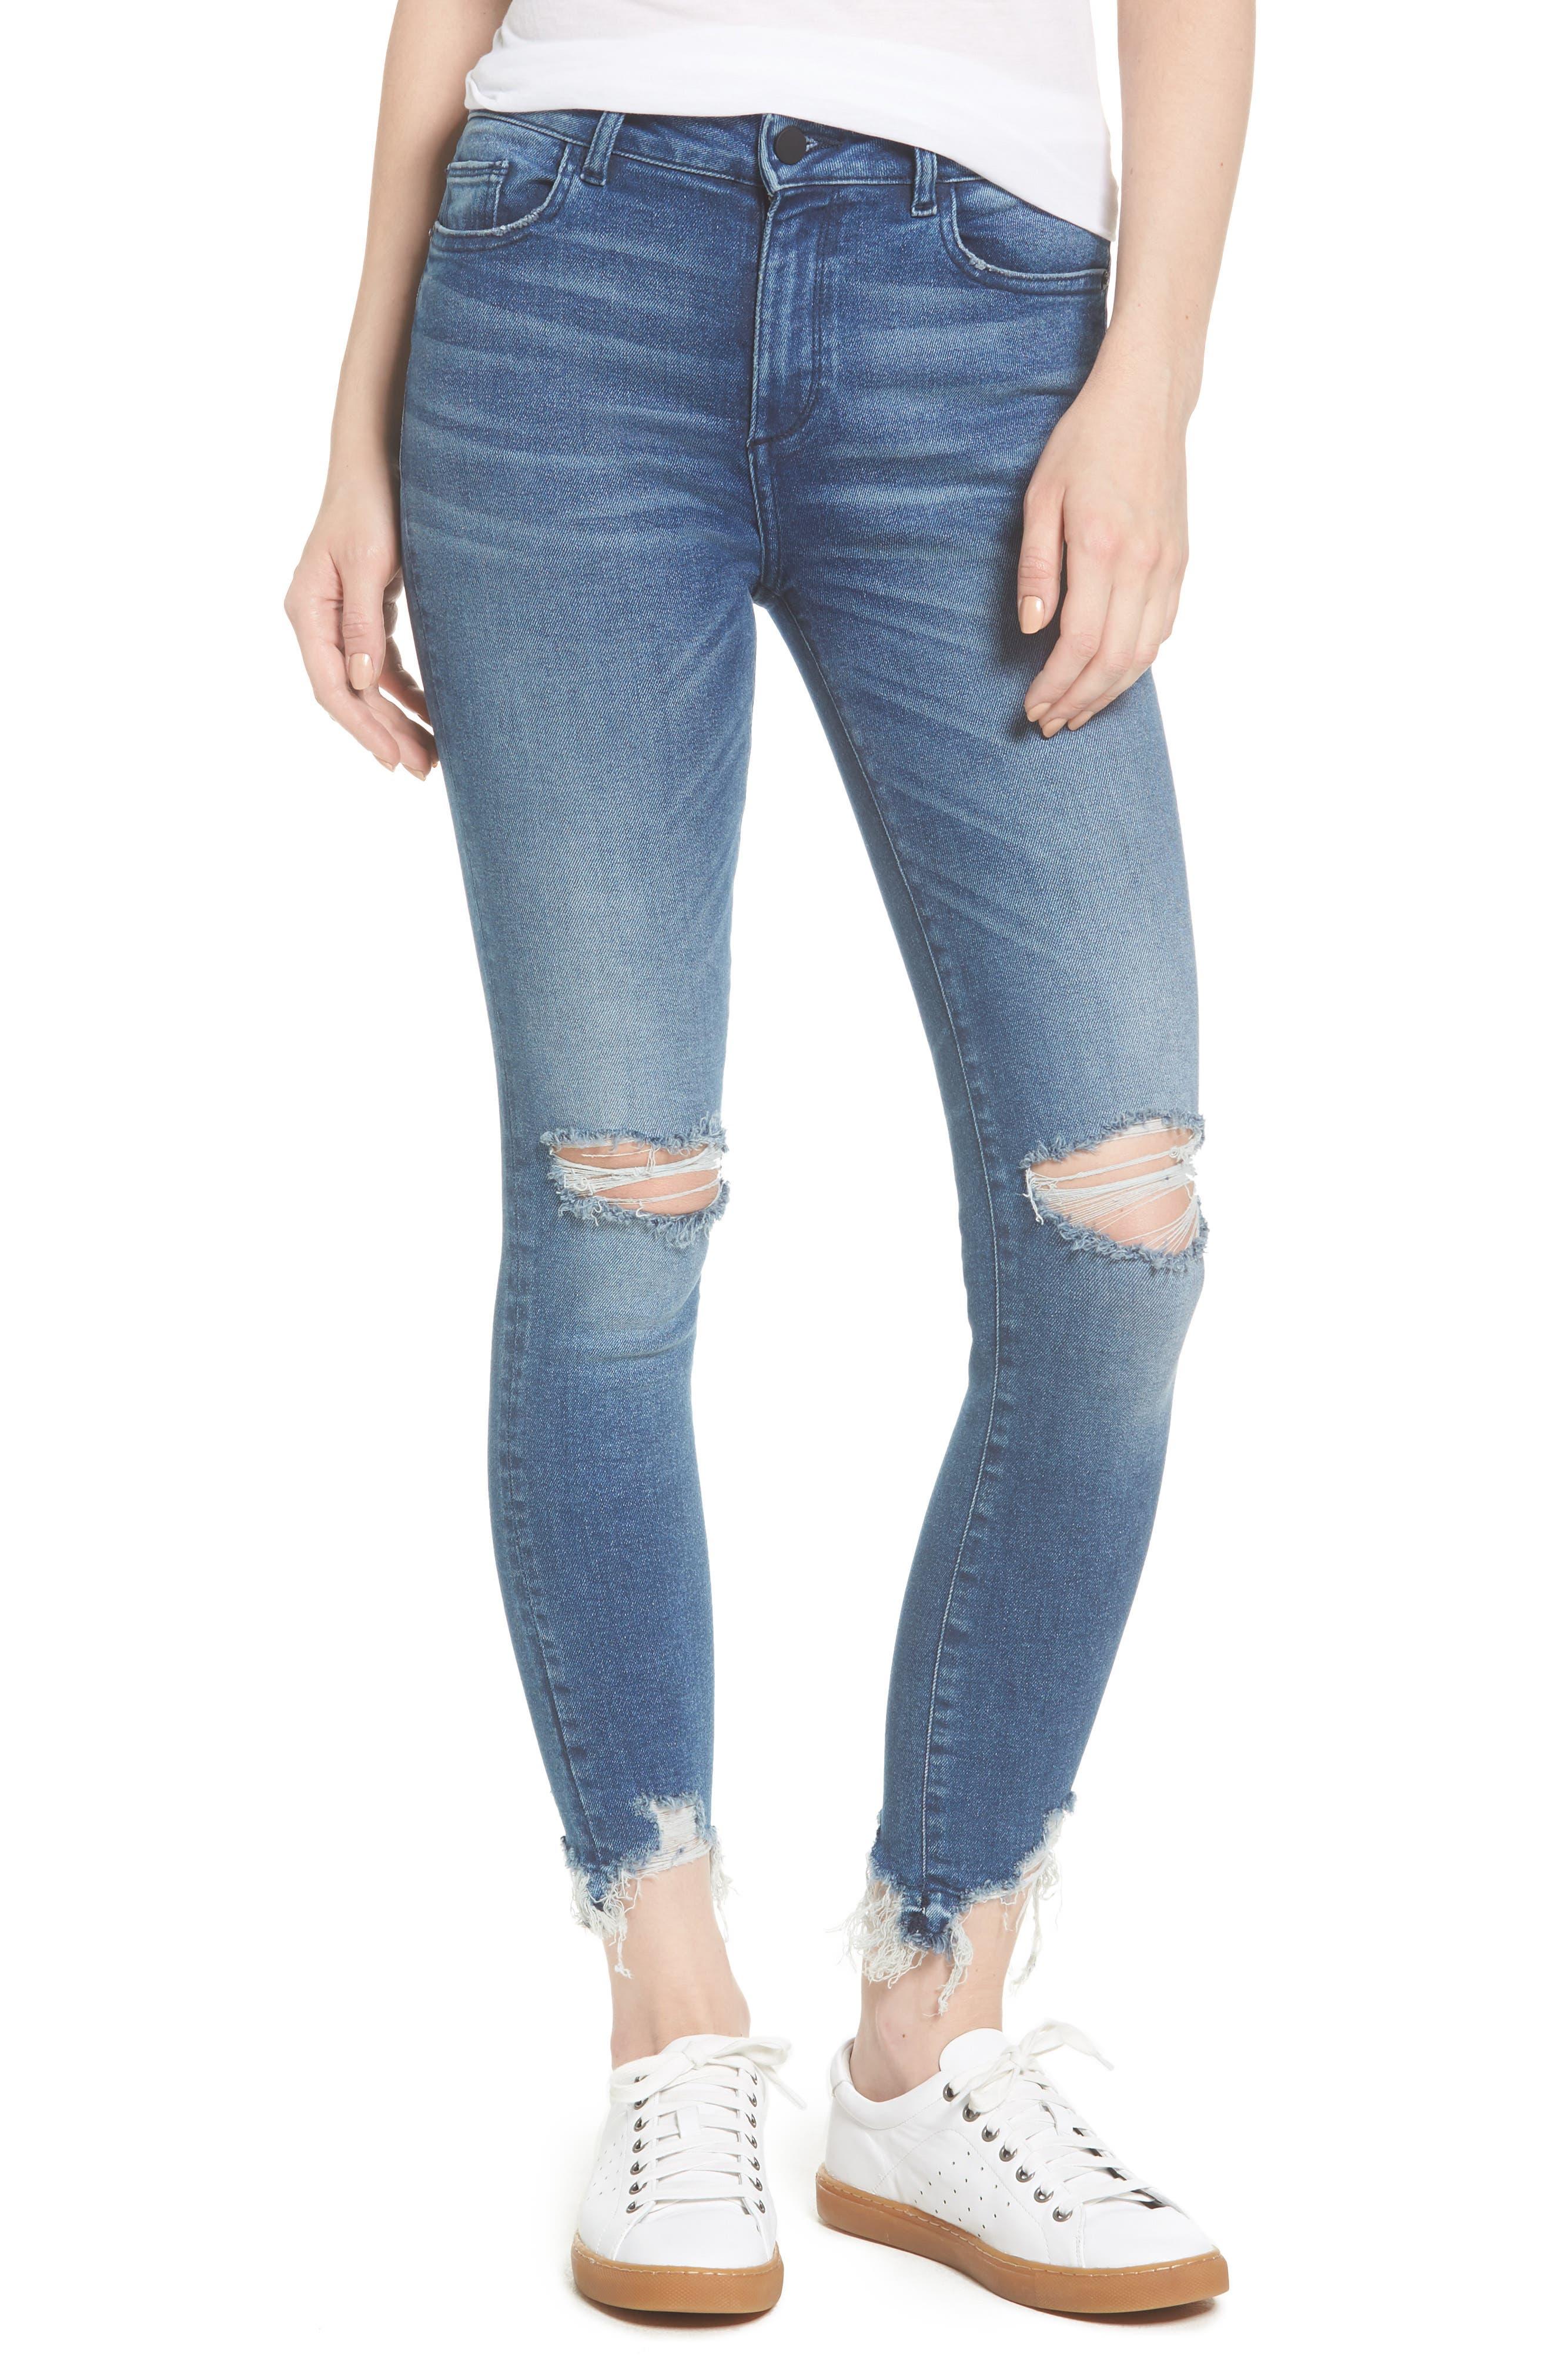 Farrow Instaslim High Waist Ankle Skinny Jeans,                         Main,                         color, 430